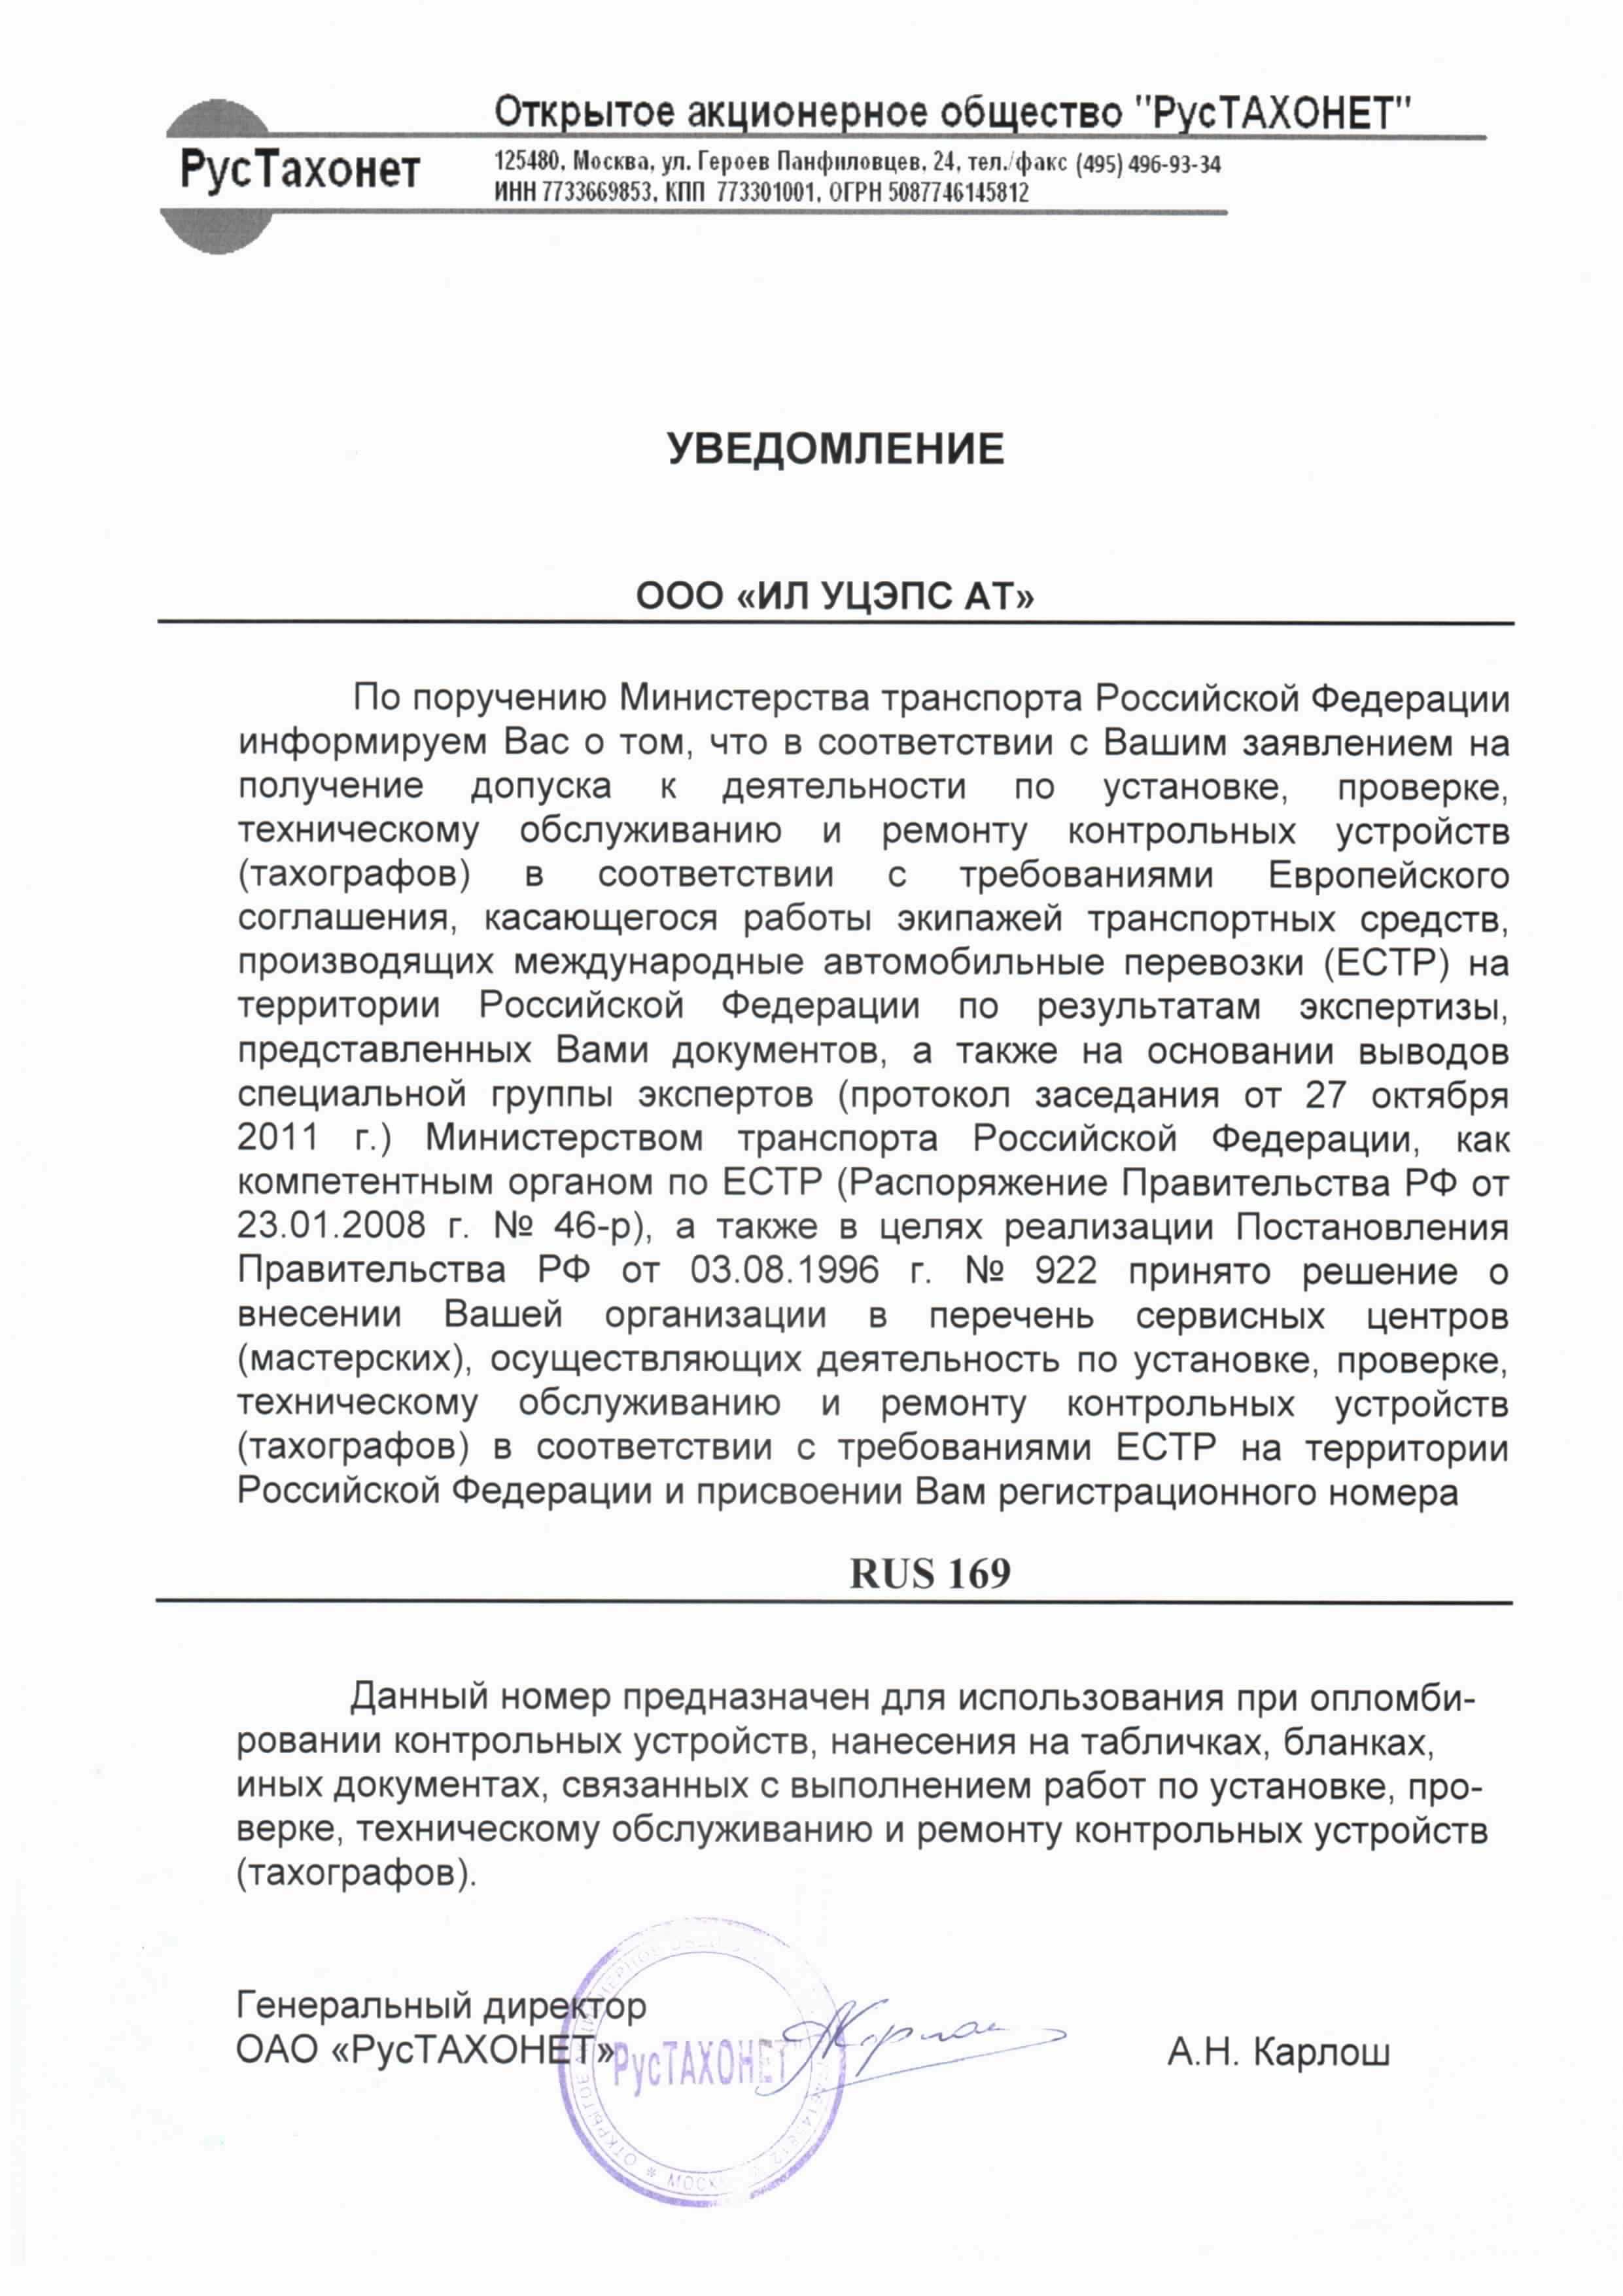 Аккредитация сервисного центра ИЛ УЦЭПС АТ